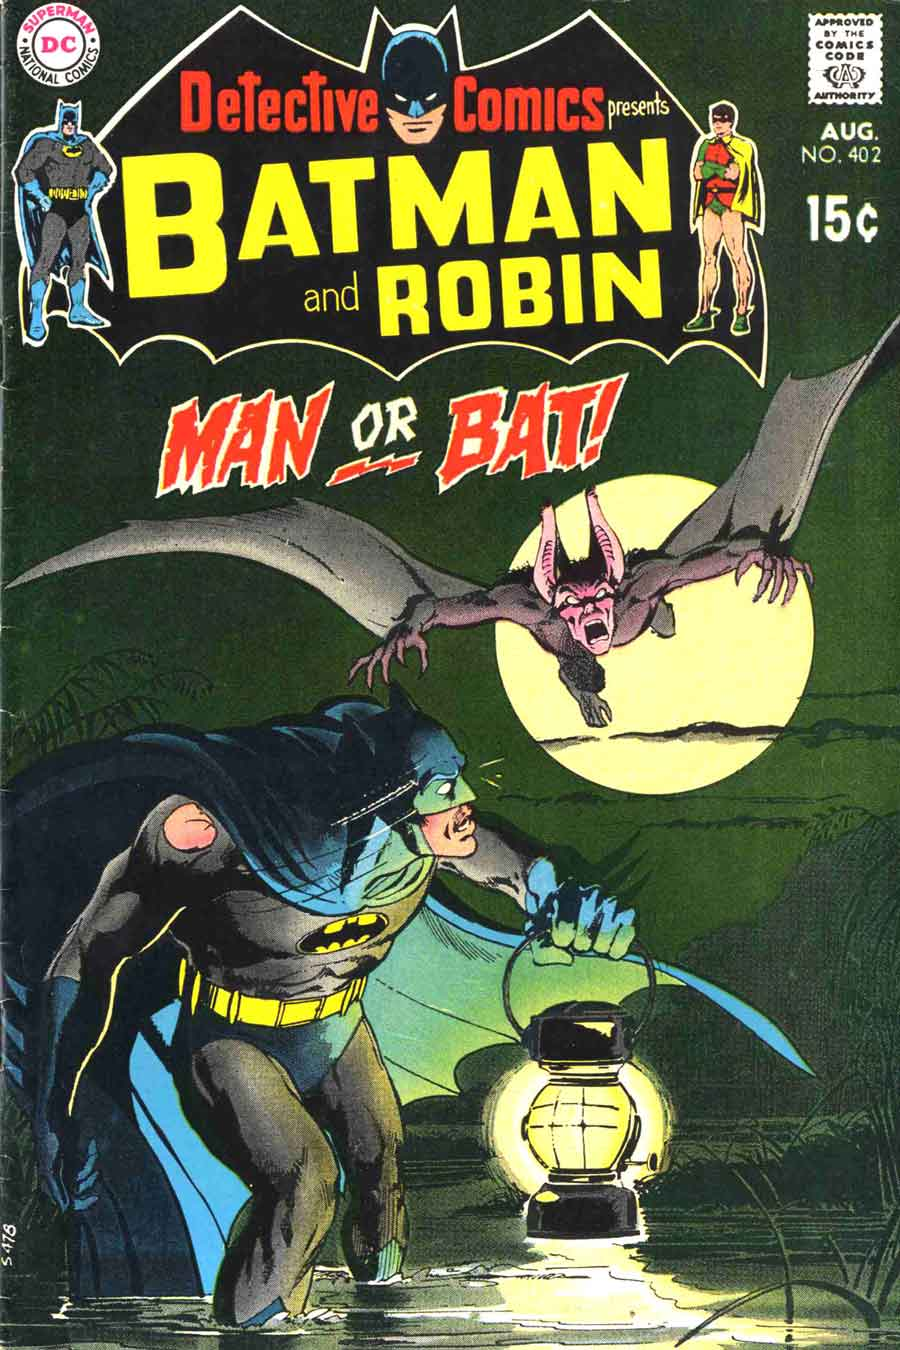 Detective Comics #402 dc Batman comic book cover art by Neal Adams